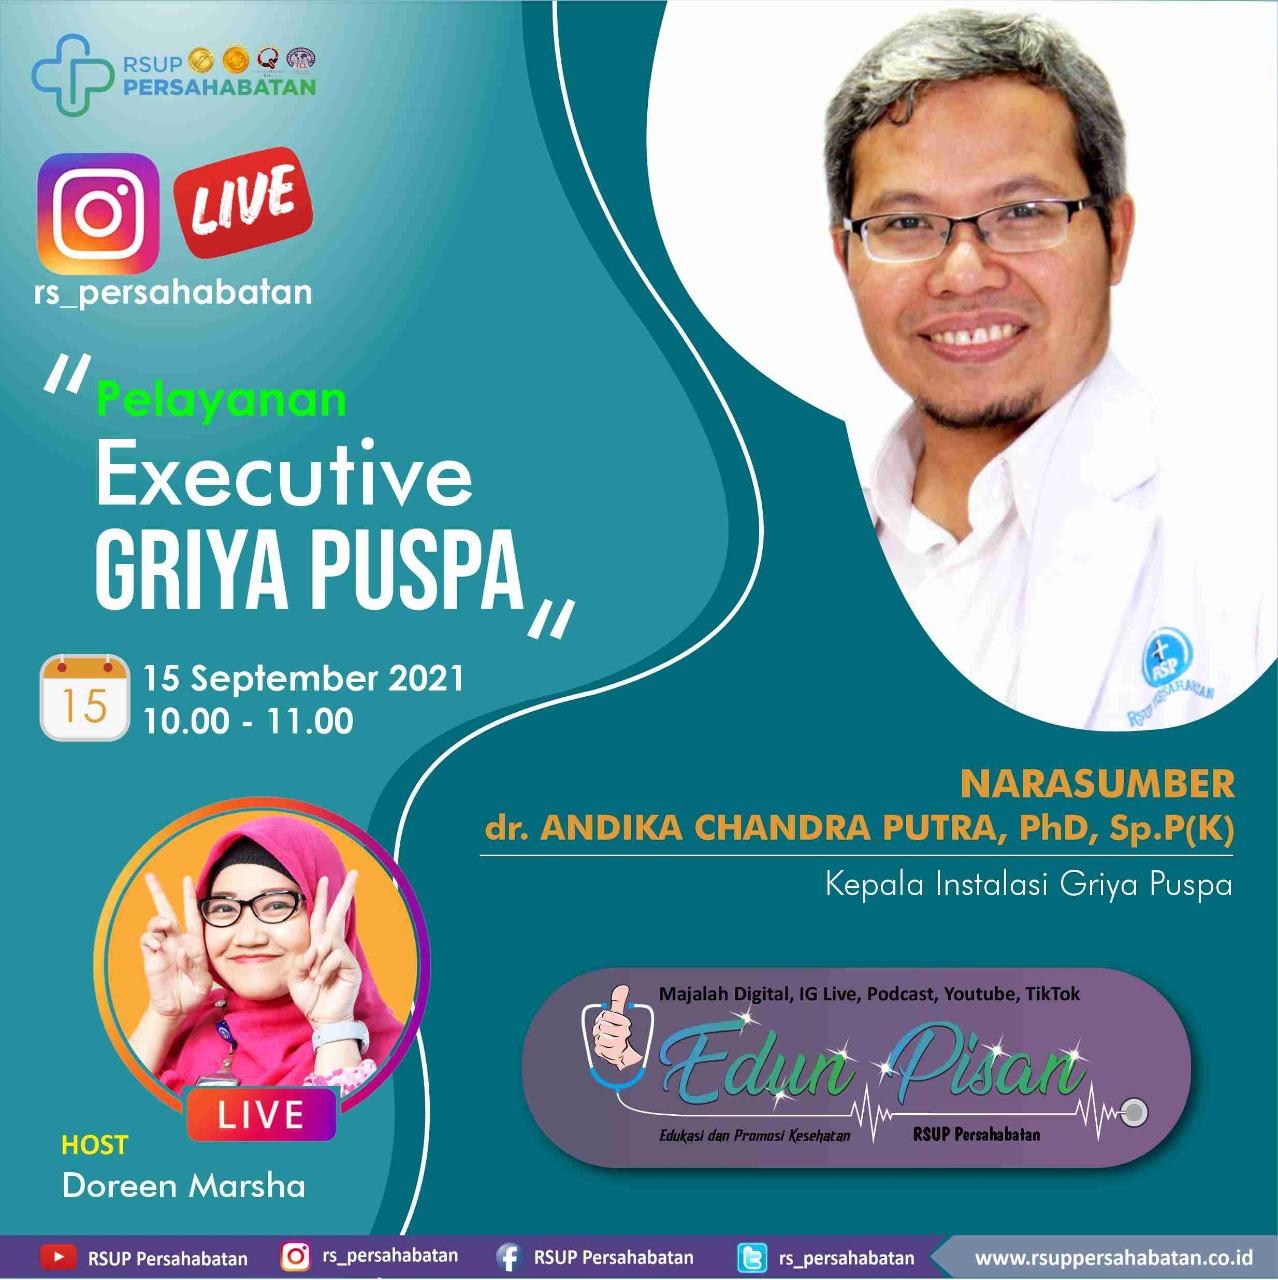 Pelayanan Executive Griya Puspa